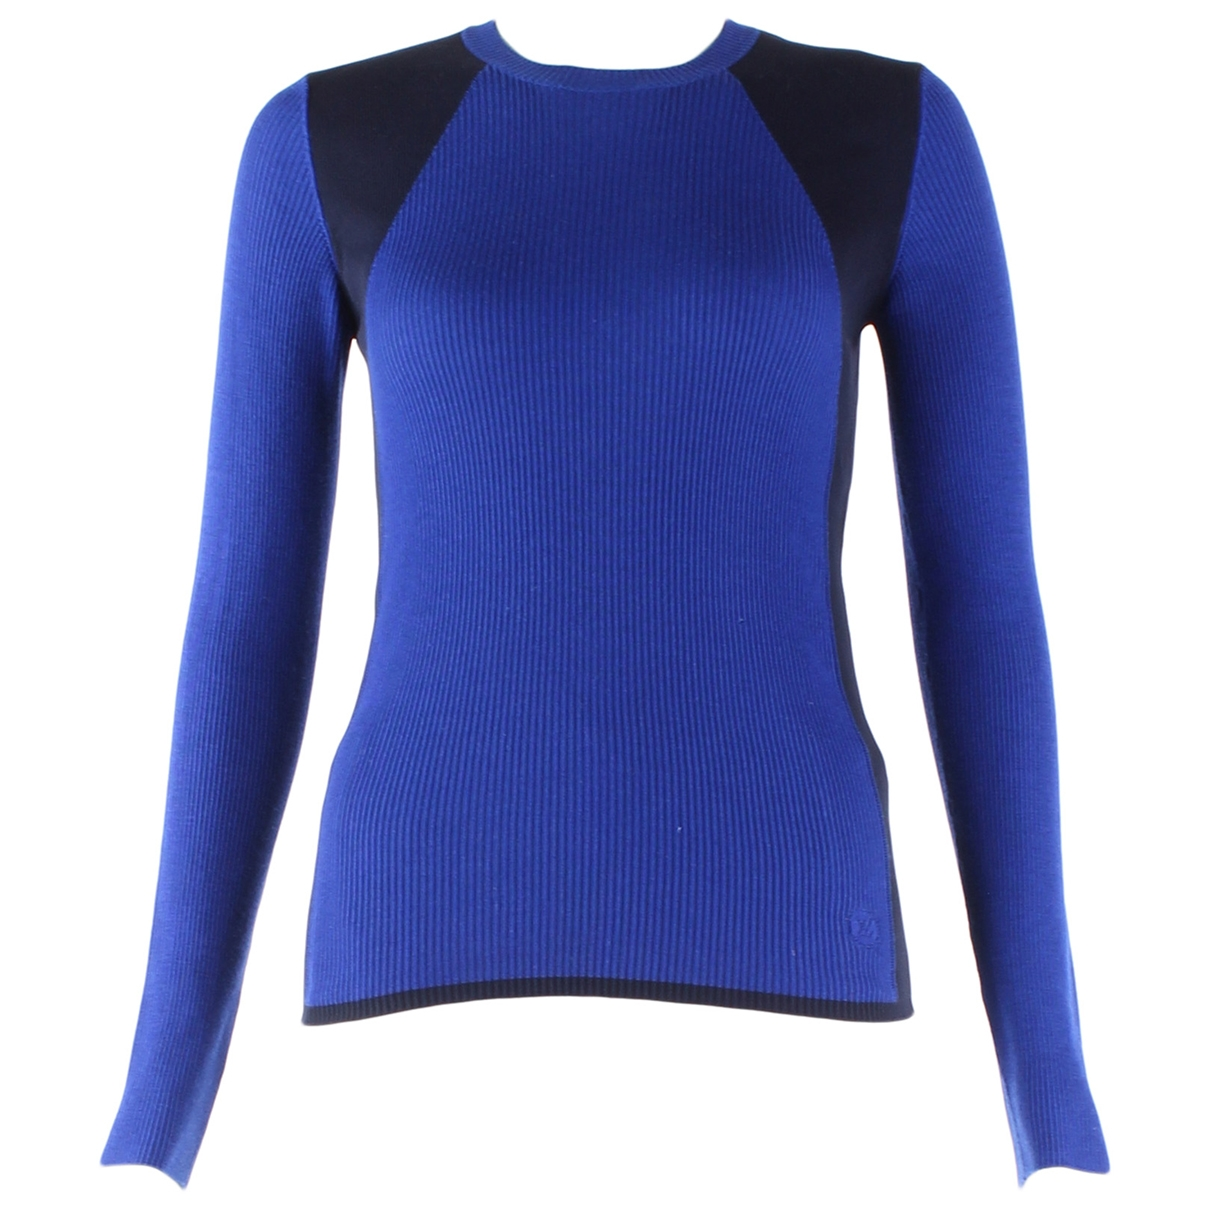 Louis Vuitton \N Blue Wool  top for Women S International